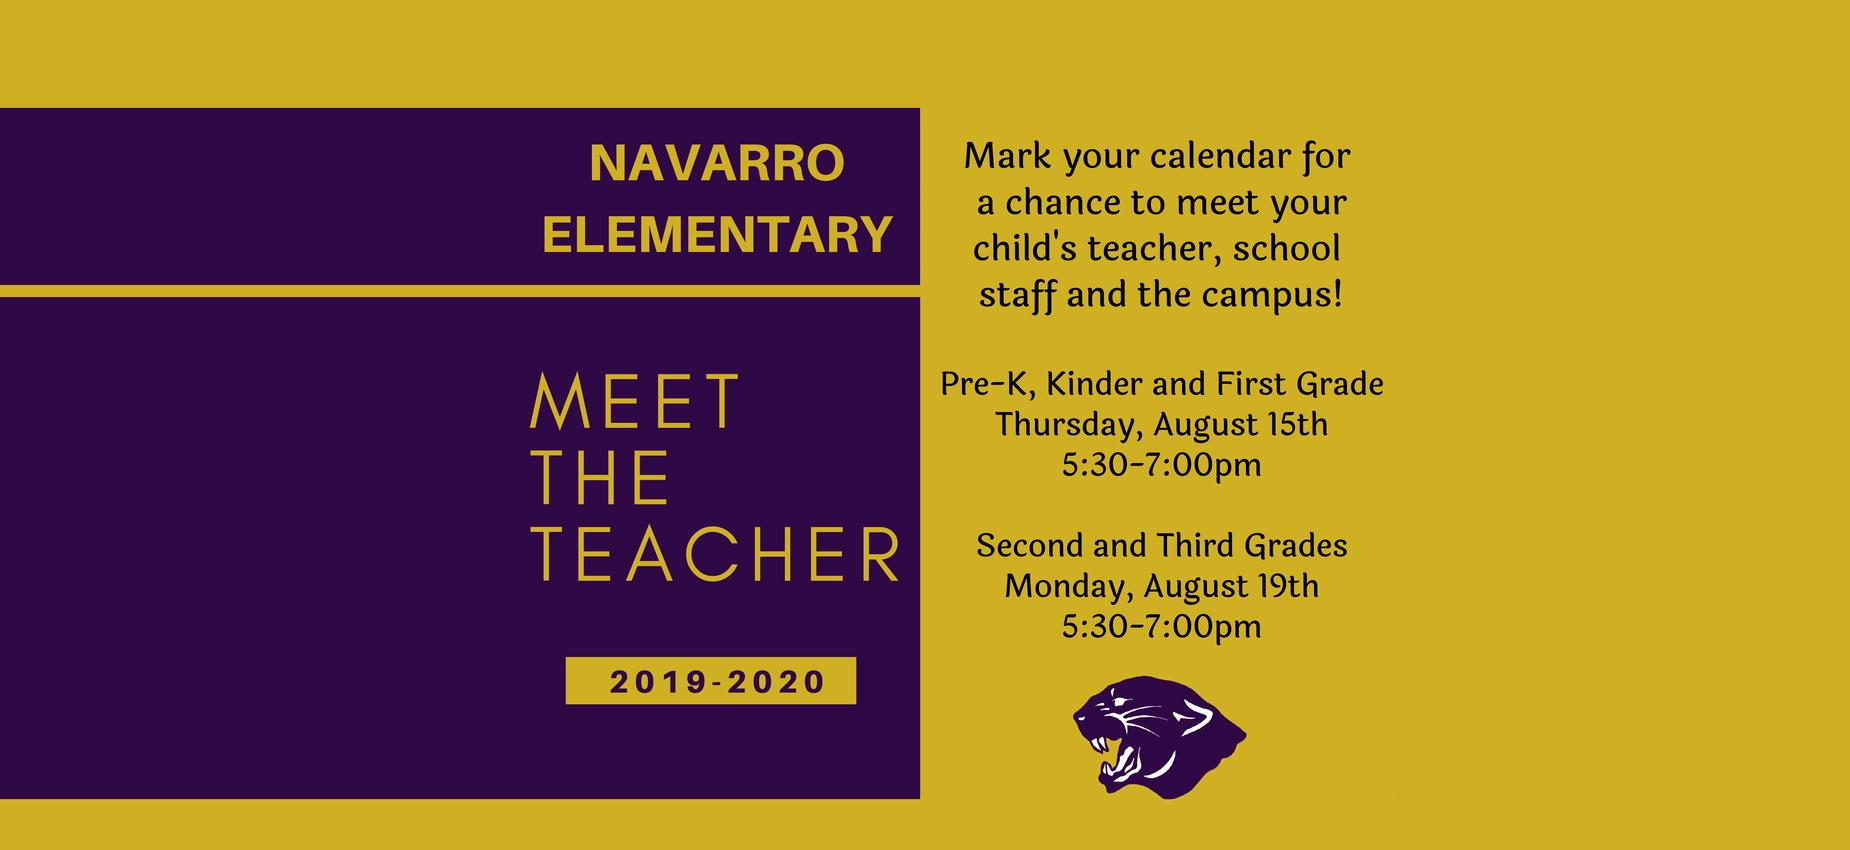 Lisd Calendar 2020.Navarro Elementary School